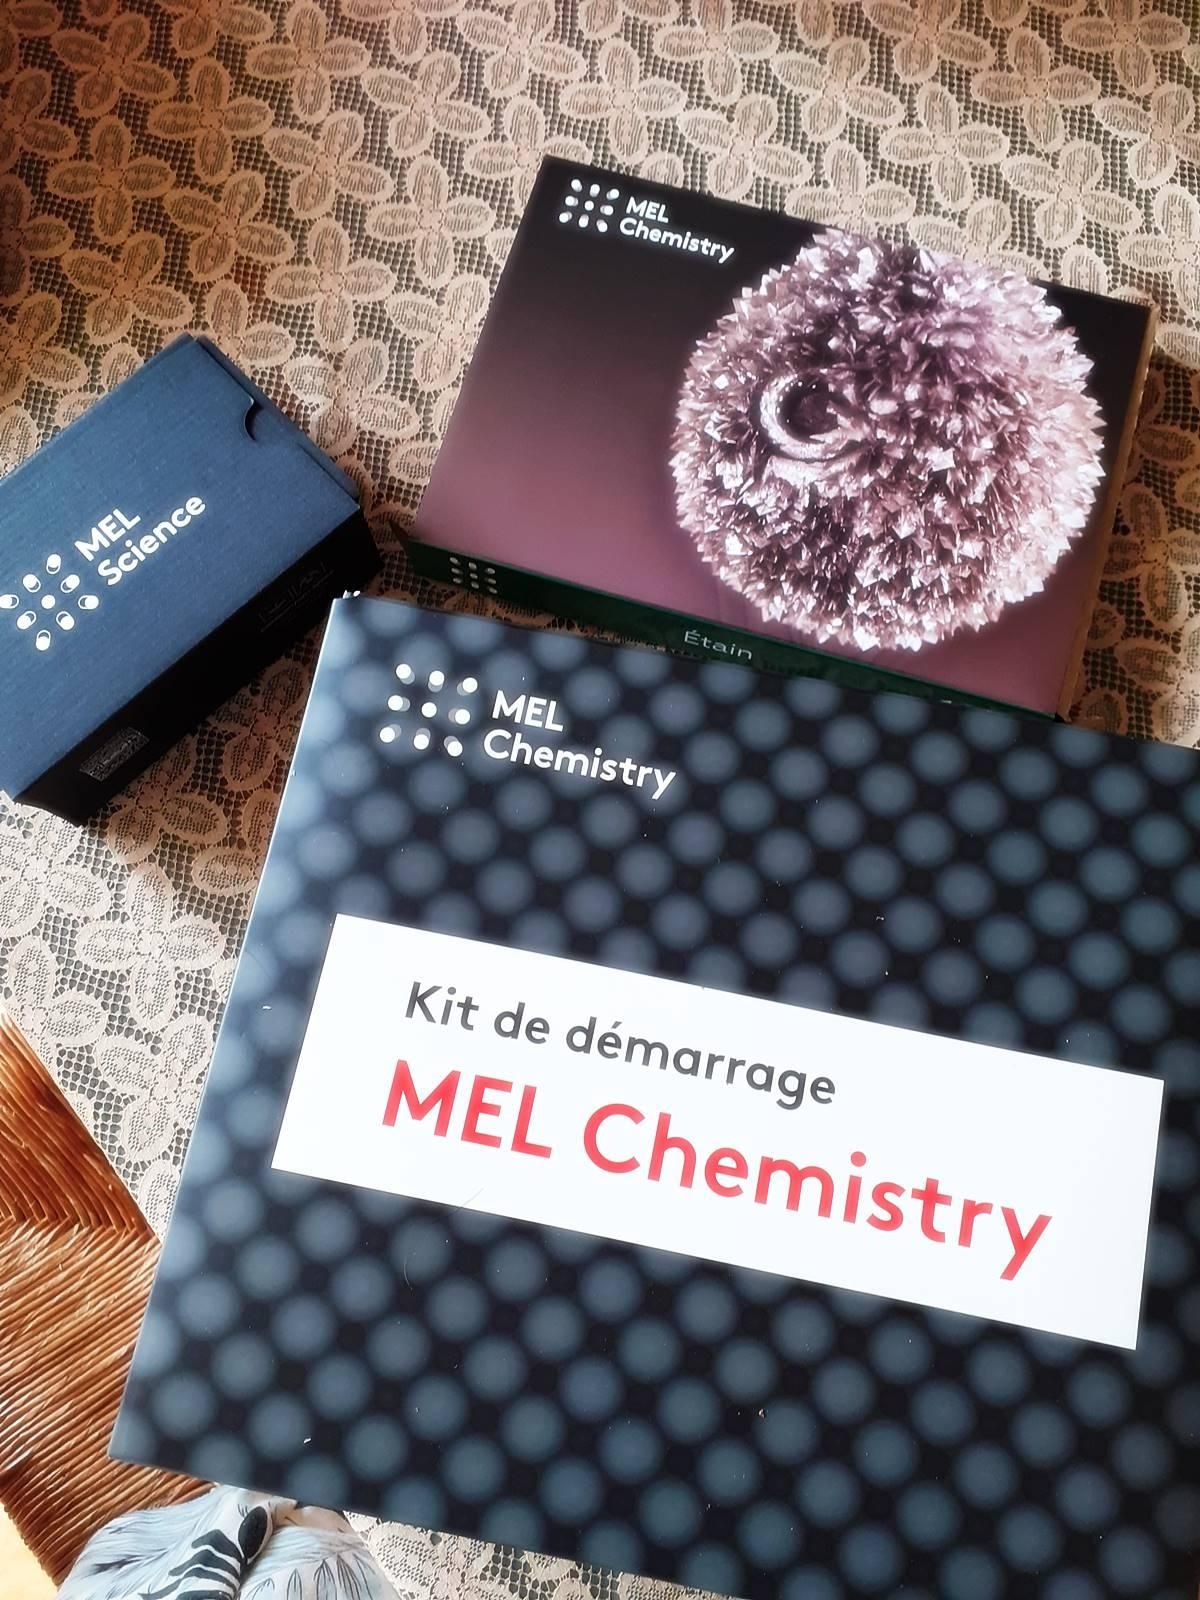 Mel science mel chchemistry20200701 131626